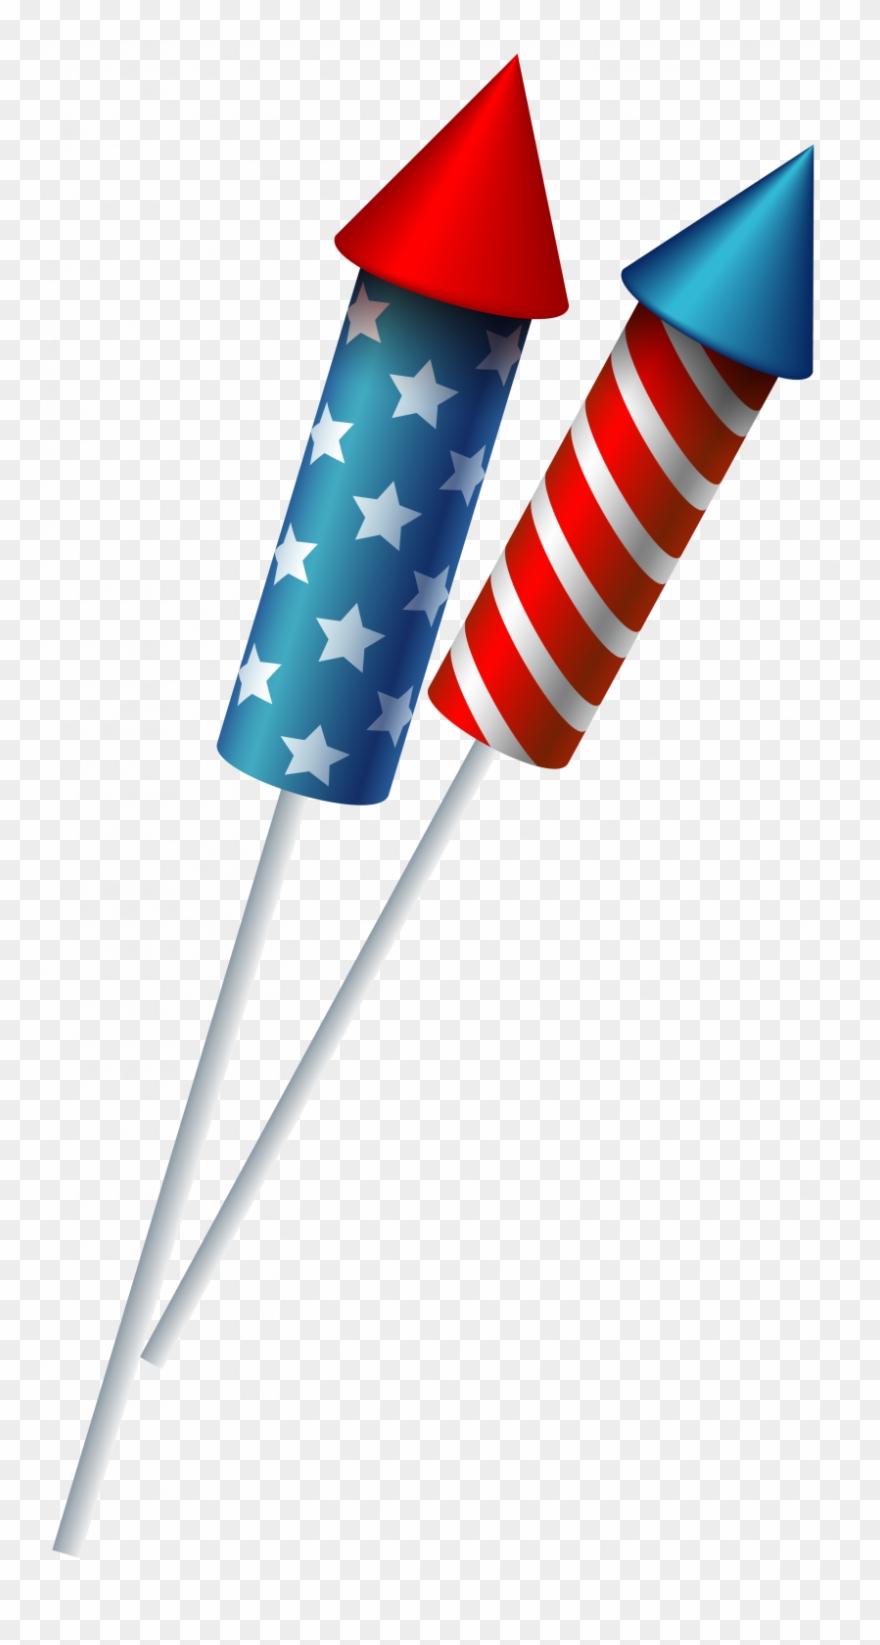 medium resolution of firework clipart rocket flag transparent background firecracker clipart png download